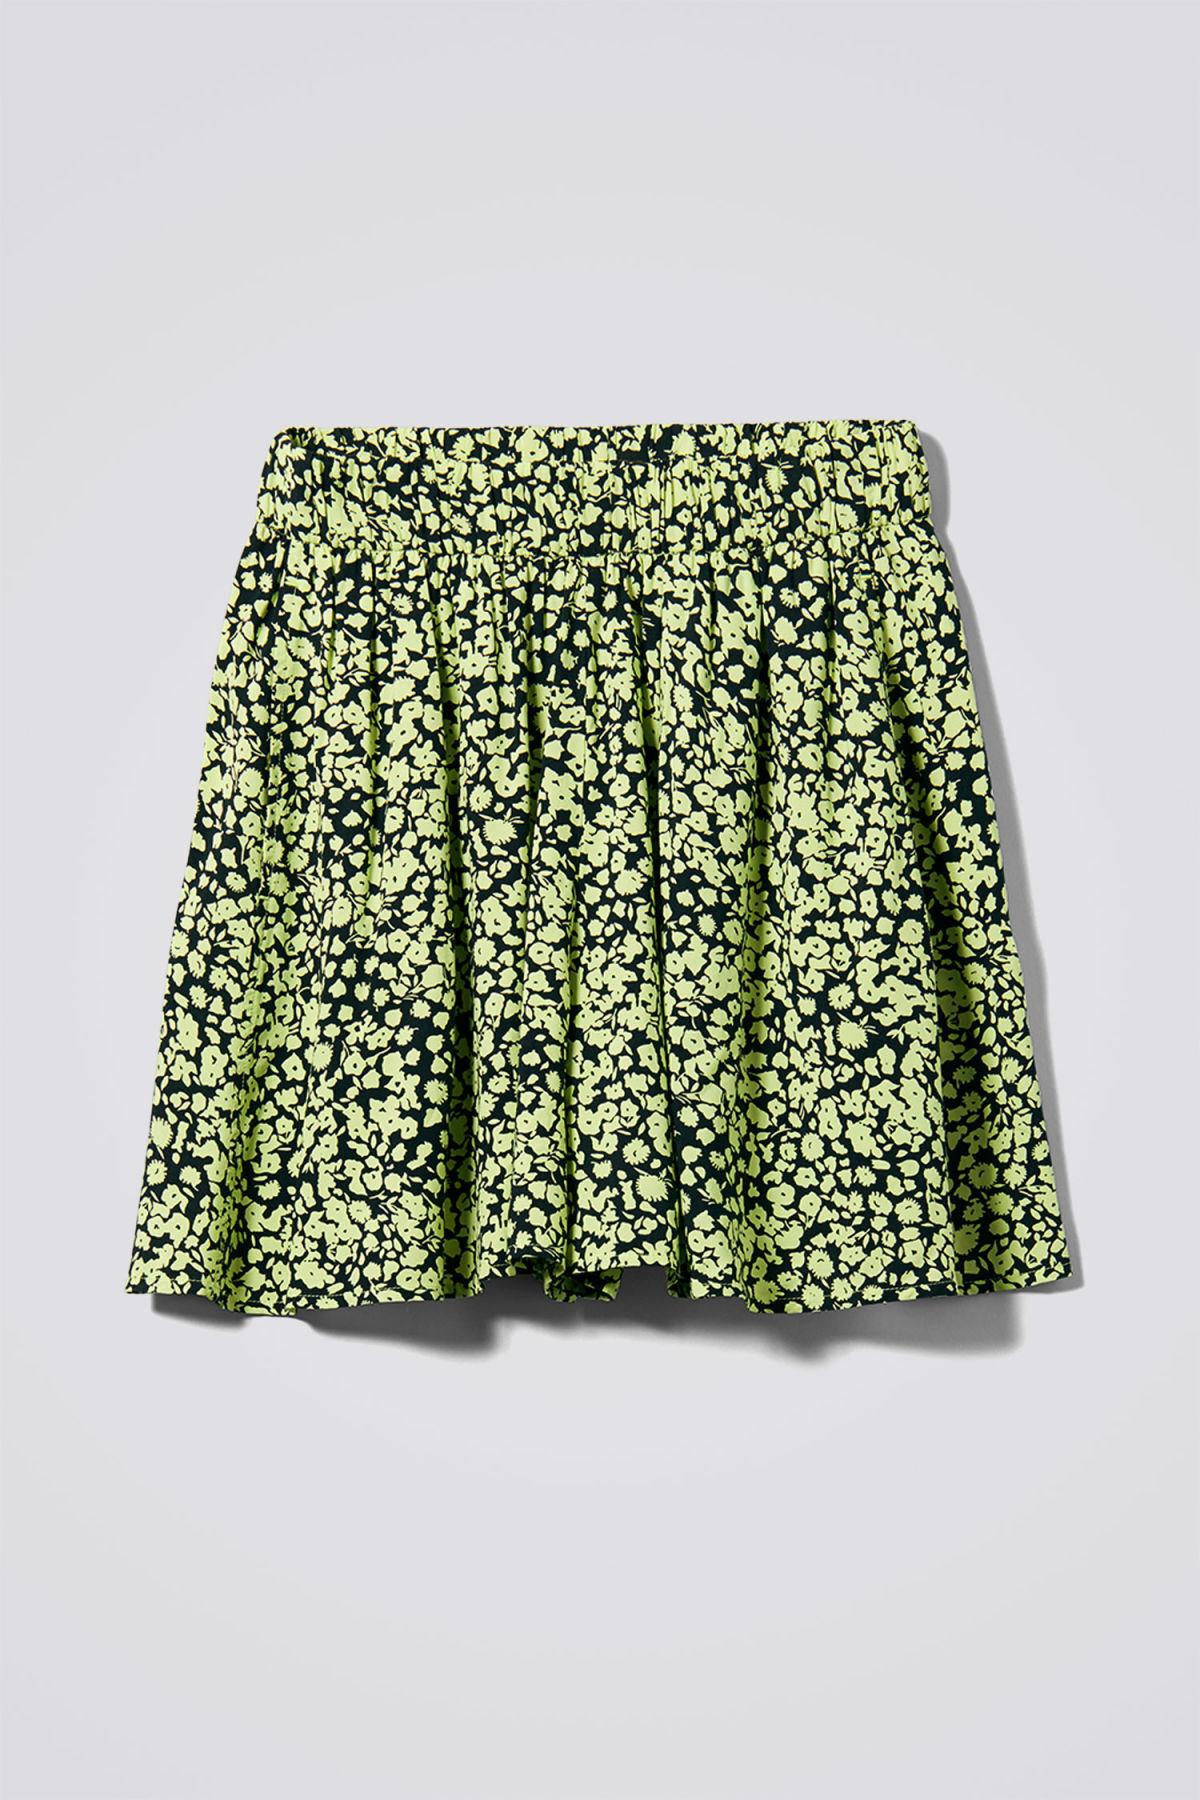 Image of Litz Shorts - Yellow-38